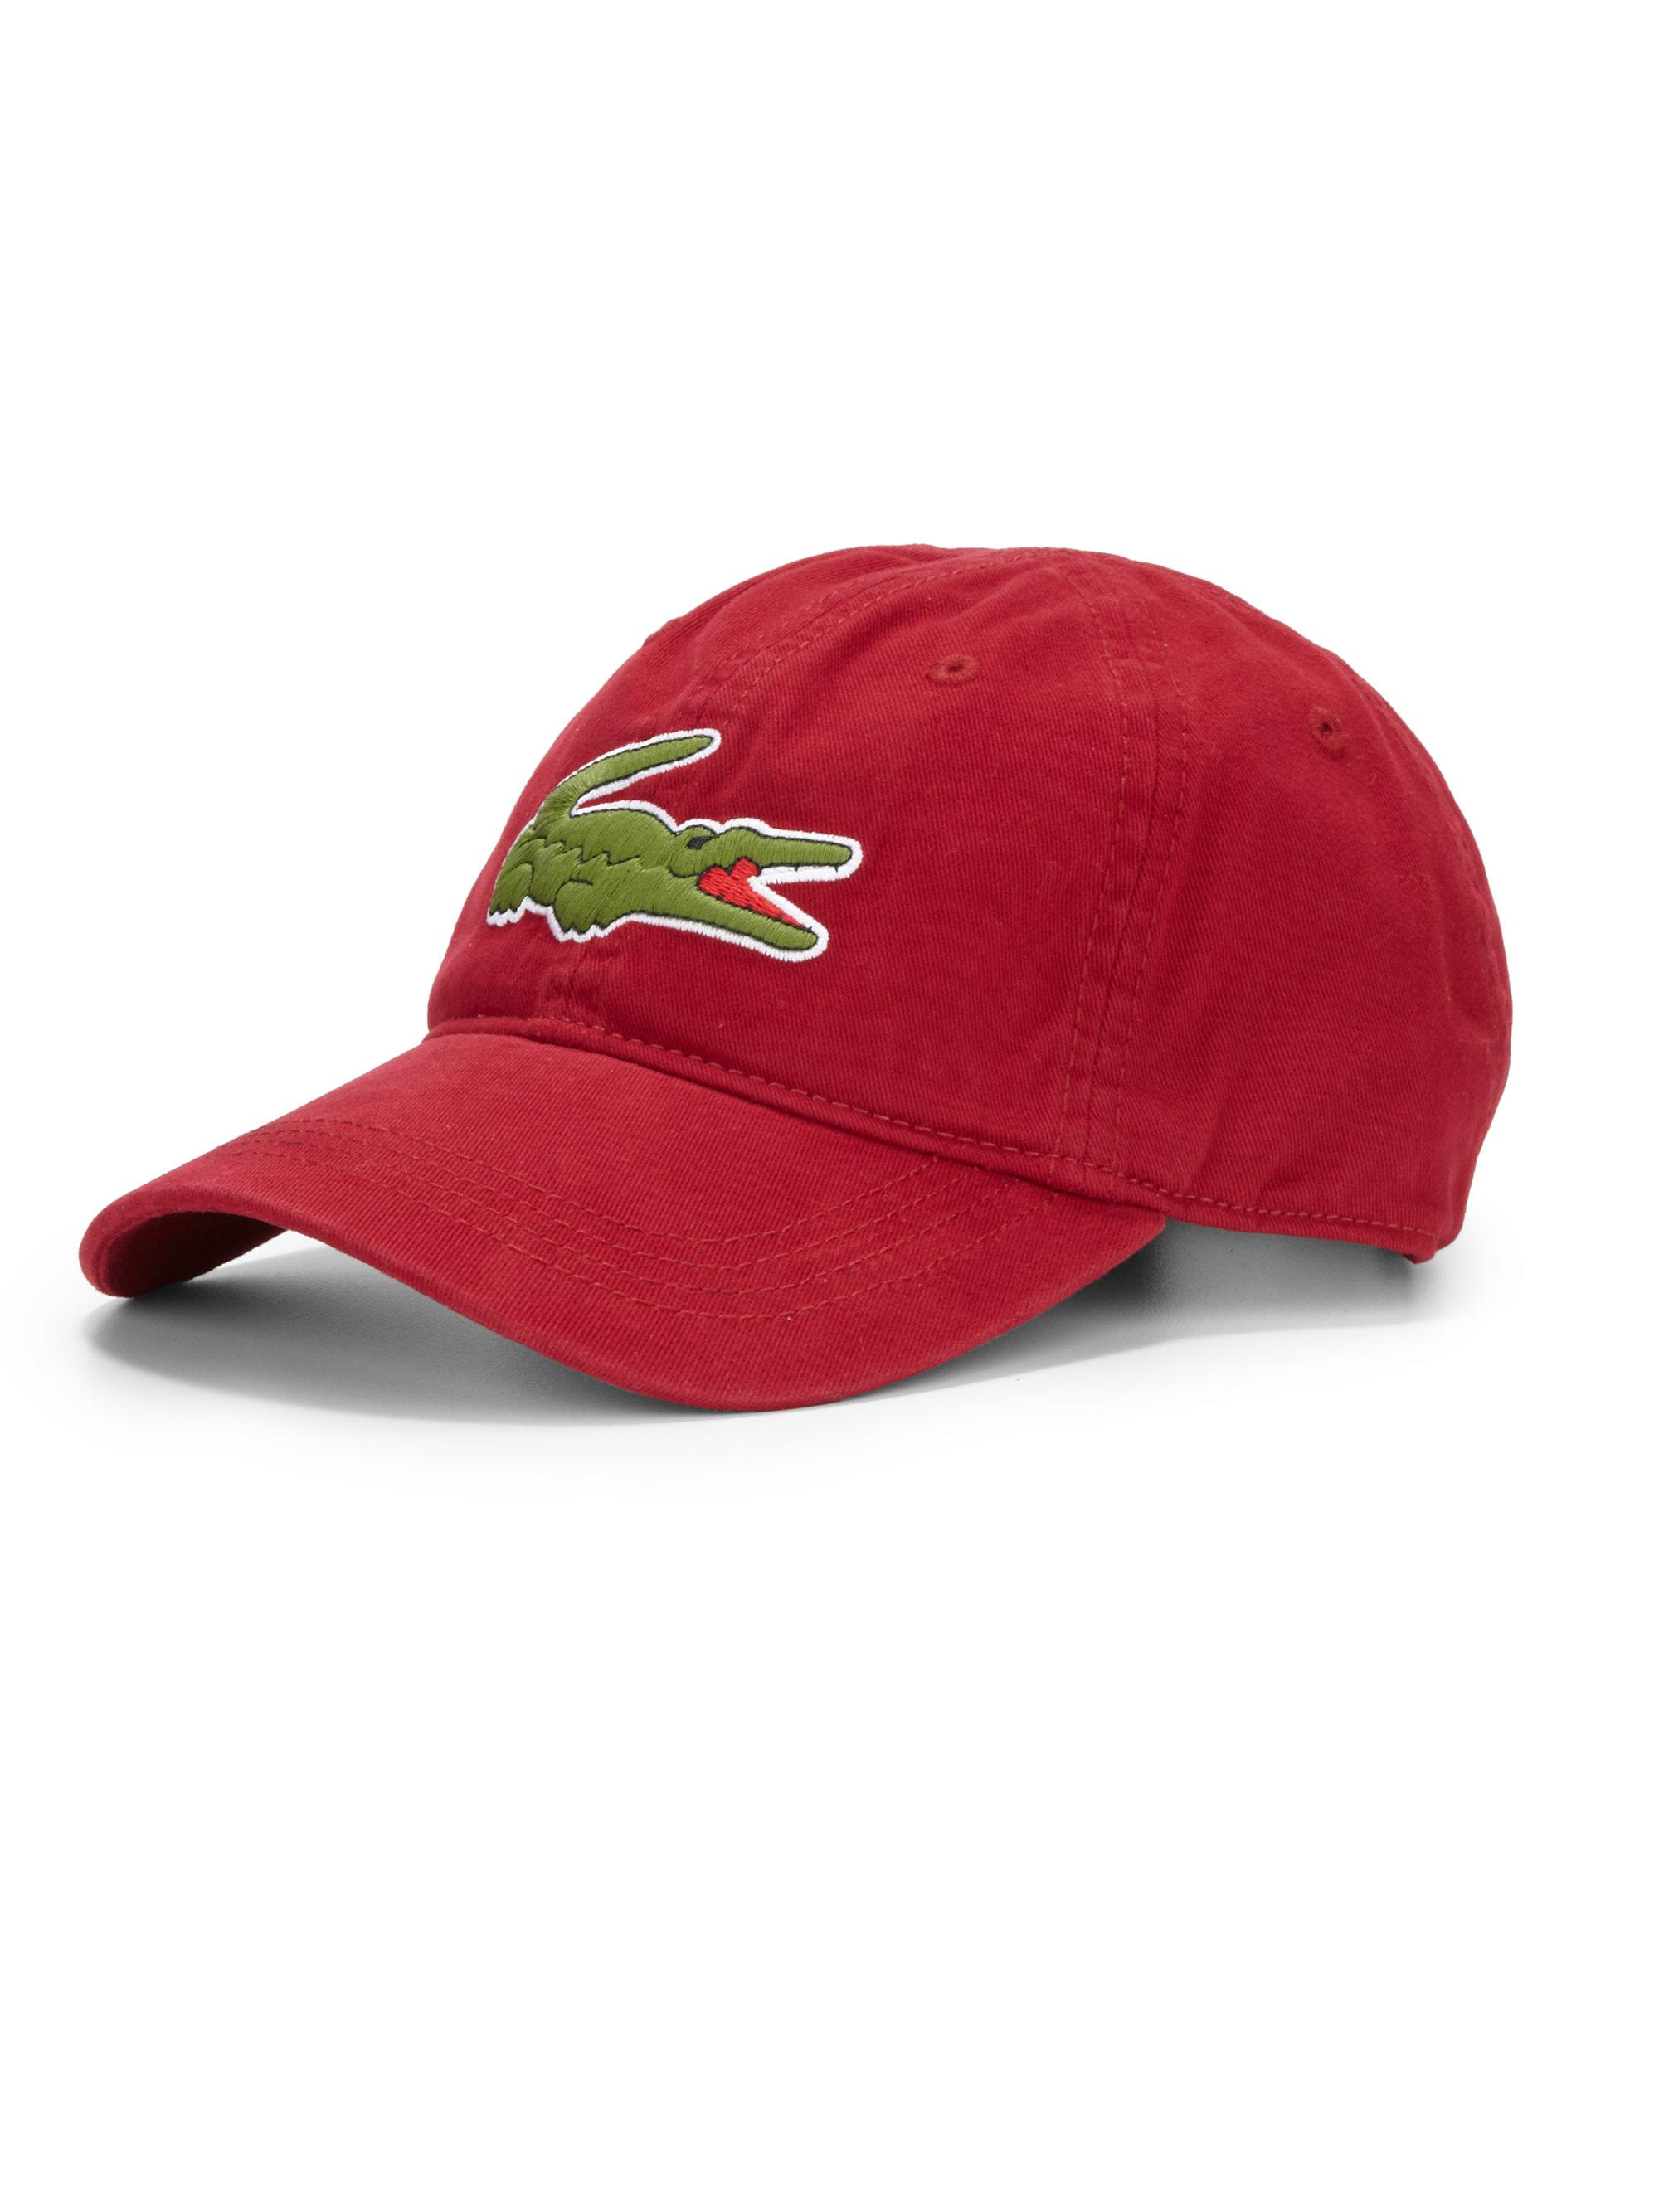 Lacoste Cotton Baseball Cap In Red For Men Bordeaux Lyst